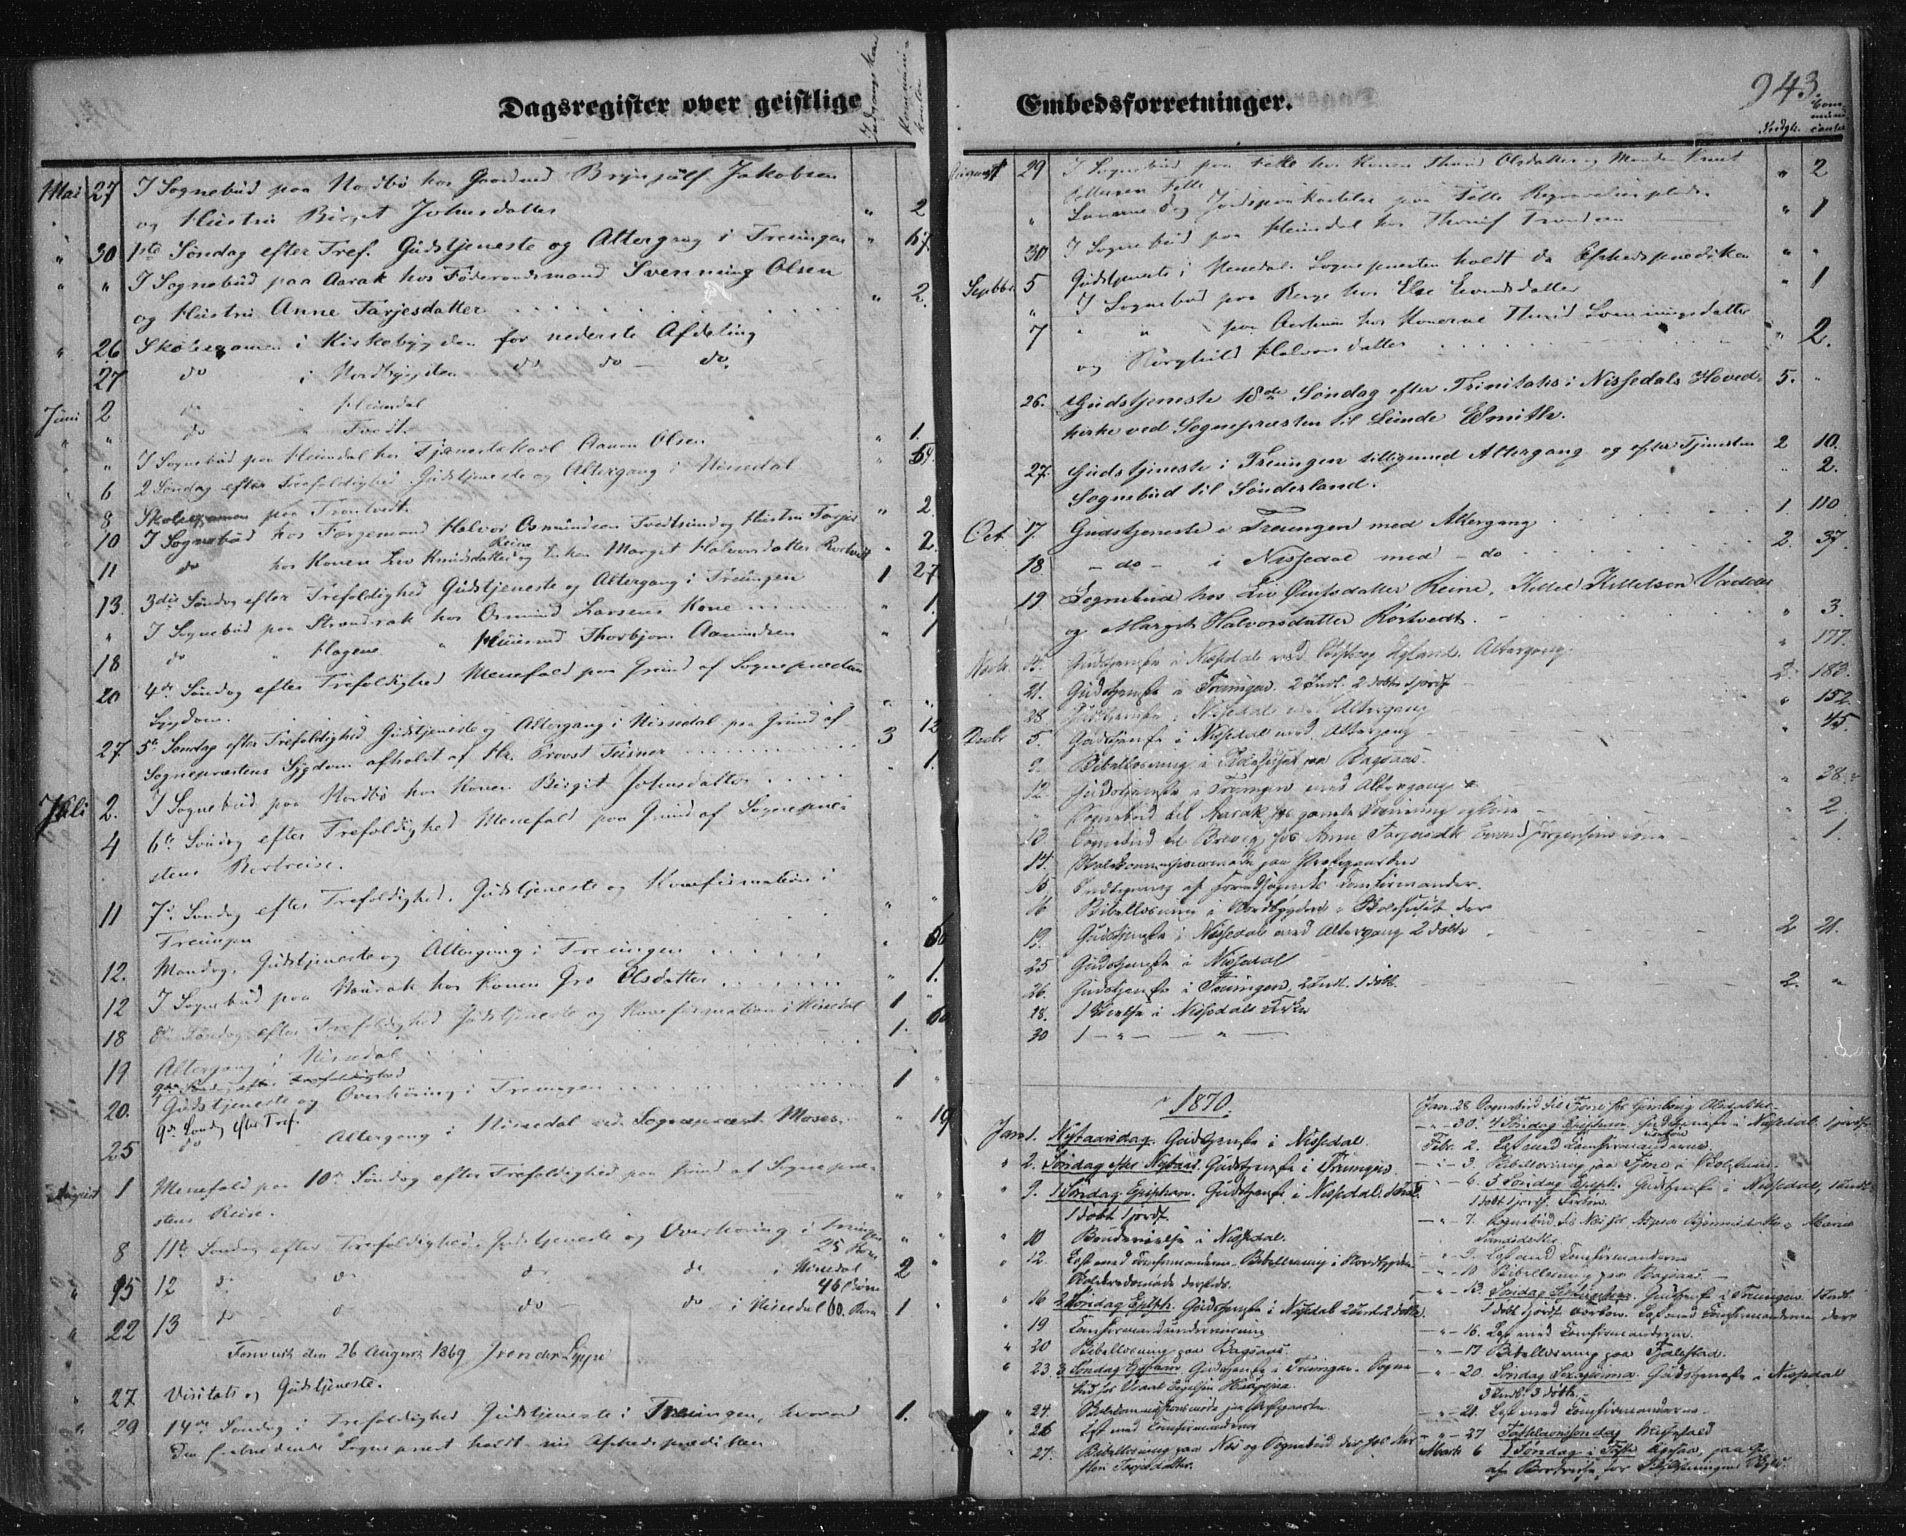 SAKO, Nissedal kirkebøker, F/Fa/L0003: Ministerialbok nr. I 3, 1846-1870, s. 942-943